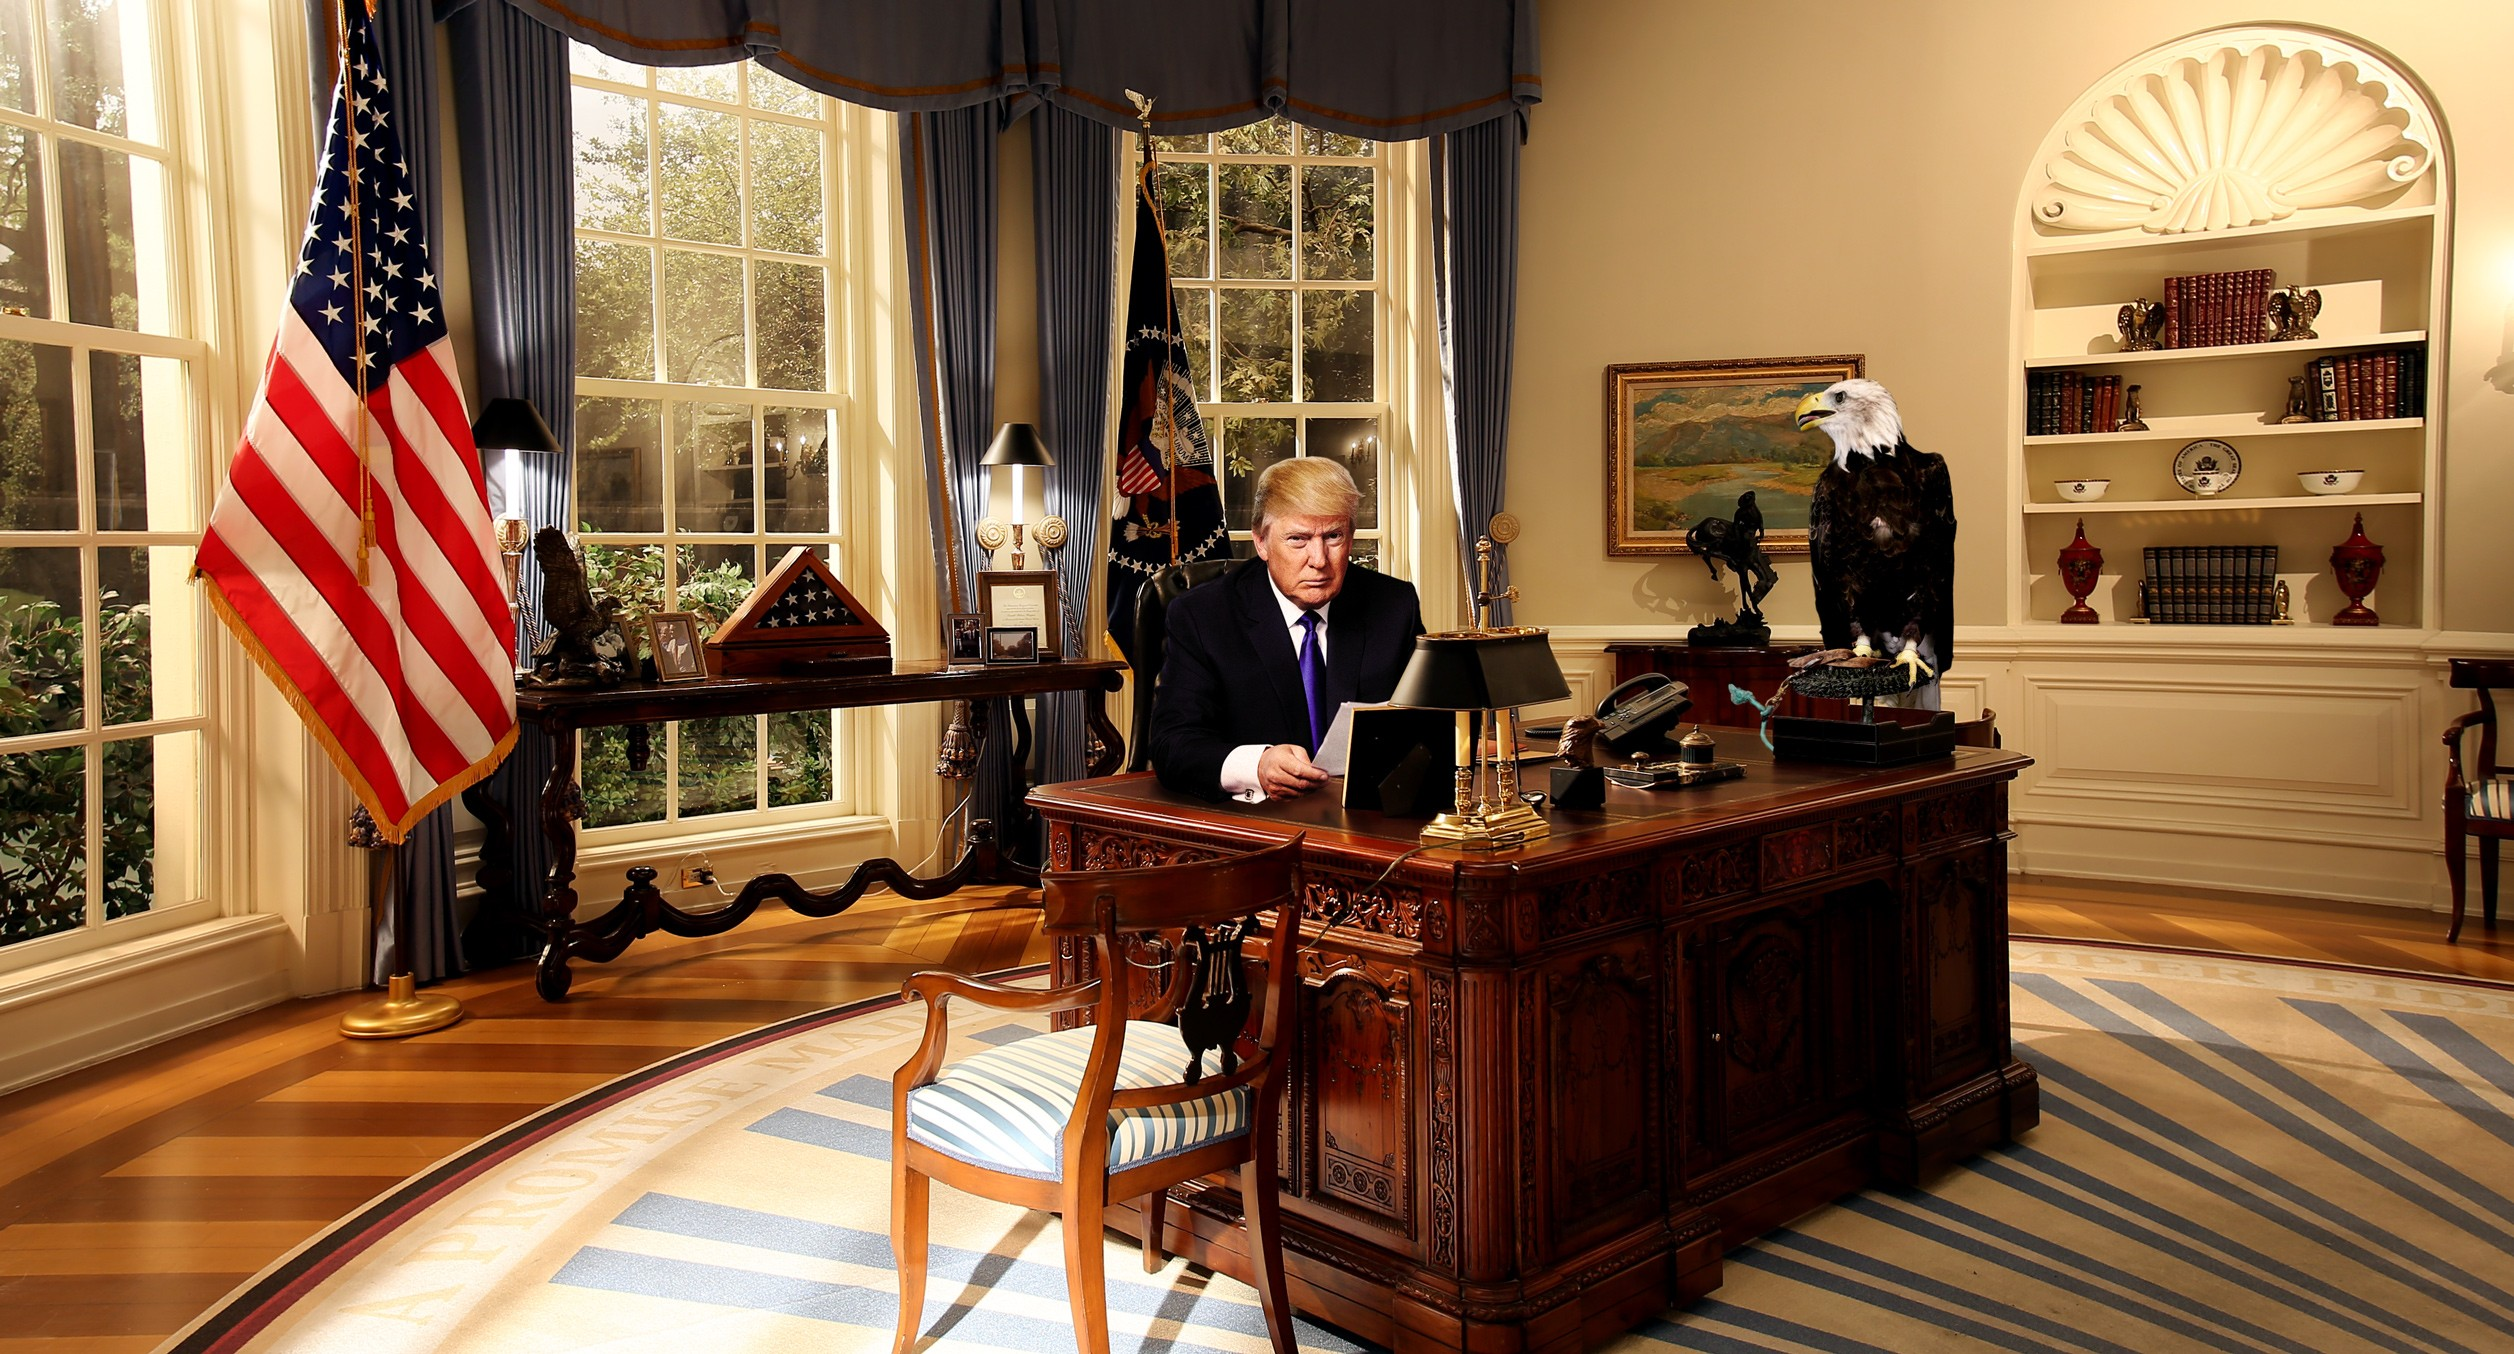 People 2514x1354 Donald Trump North America freedom Democracy politics blonde American flag flag USA presidents Stars and Stripes